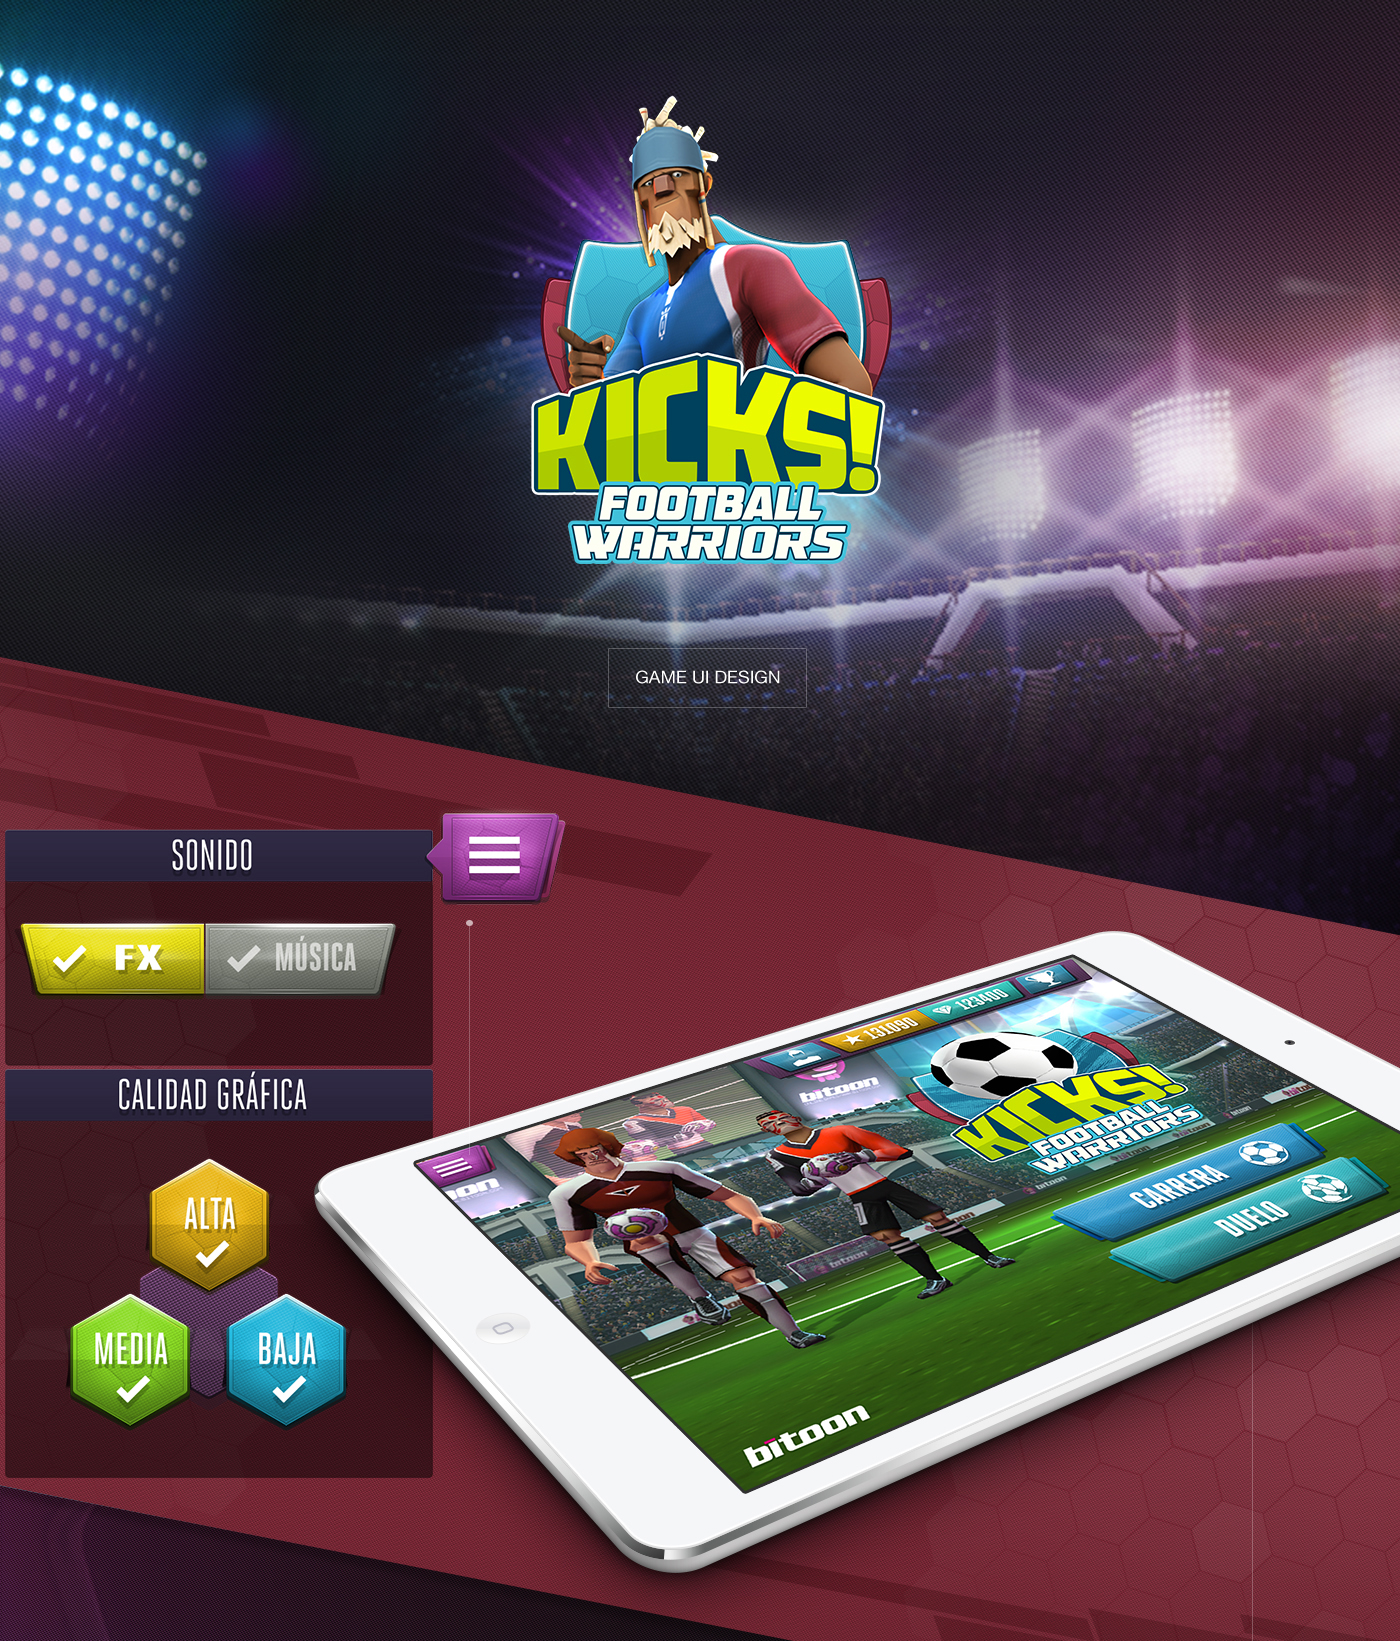 Kicks Football Warriors GAME UI DESIGN On Behance - Game ui design